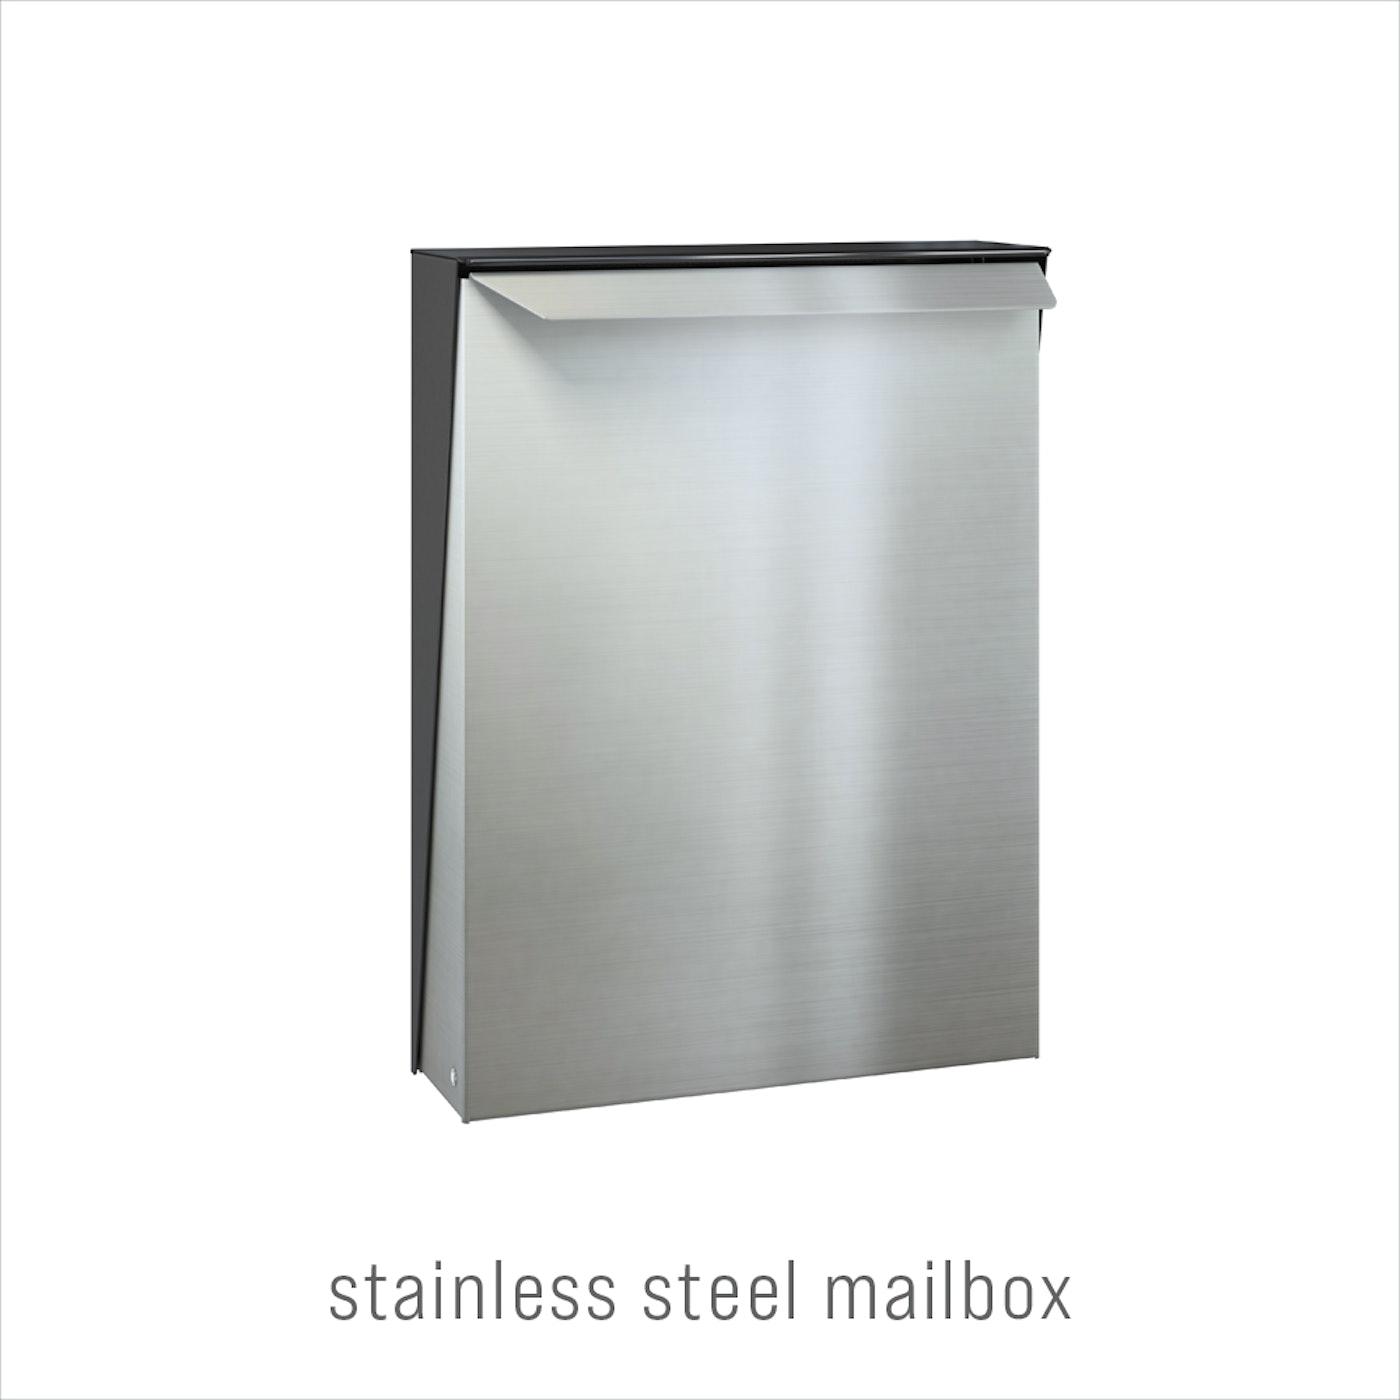 door accessories stainless steel mailbox beige Urban Front 1